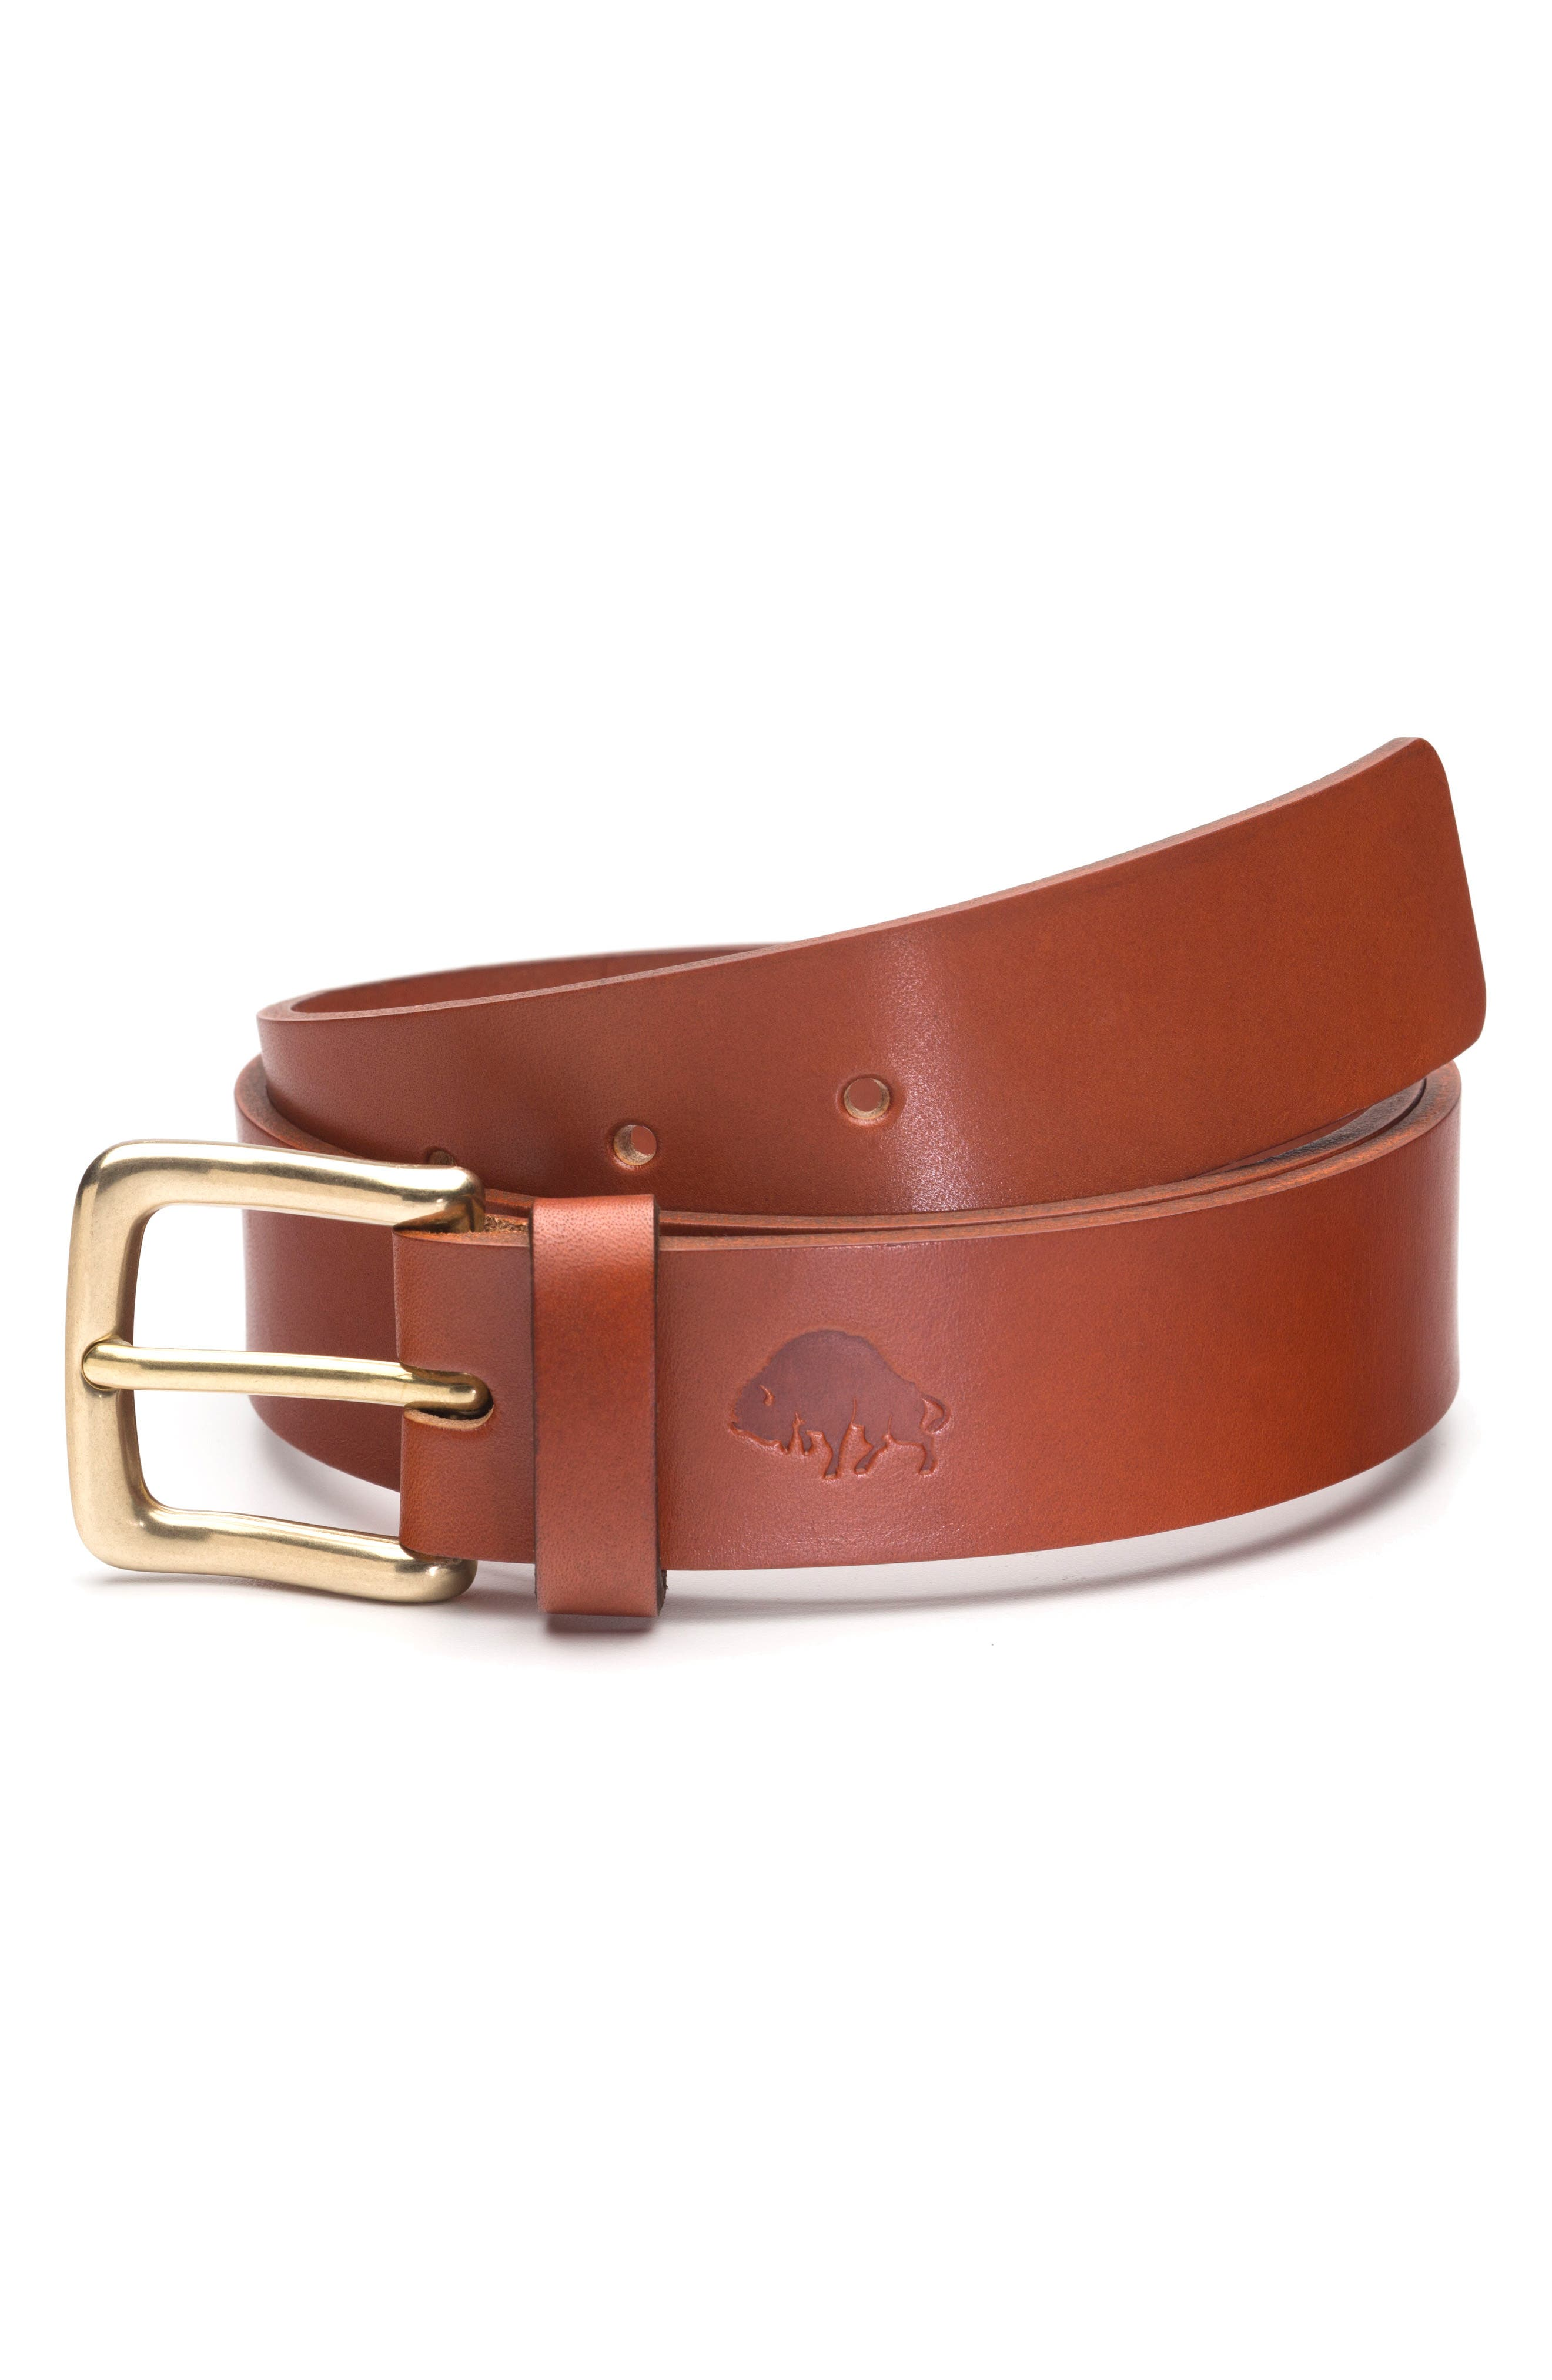 Alternate Image 1 Selected - Ezra Arthur No. 1 Leather Belt